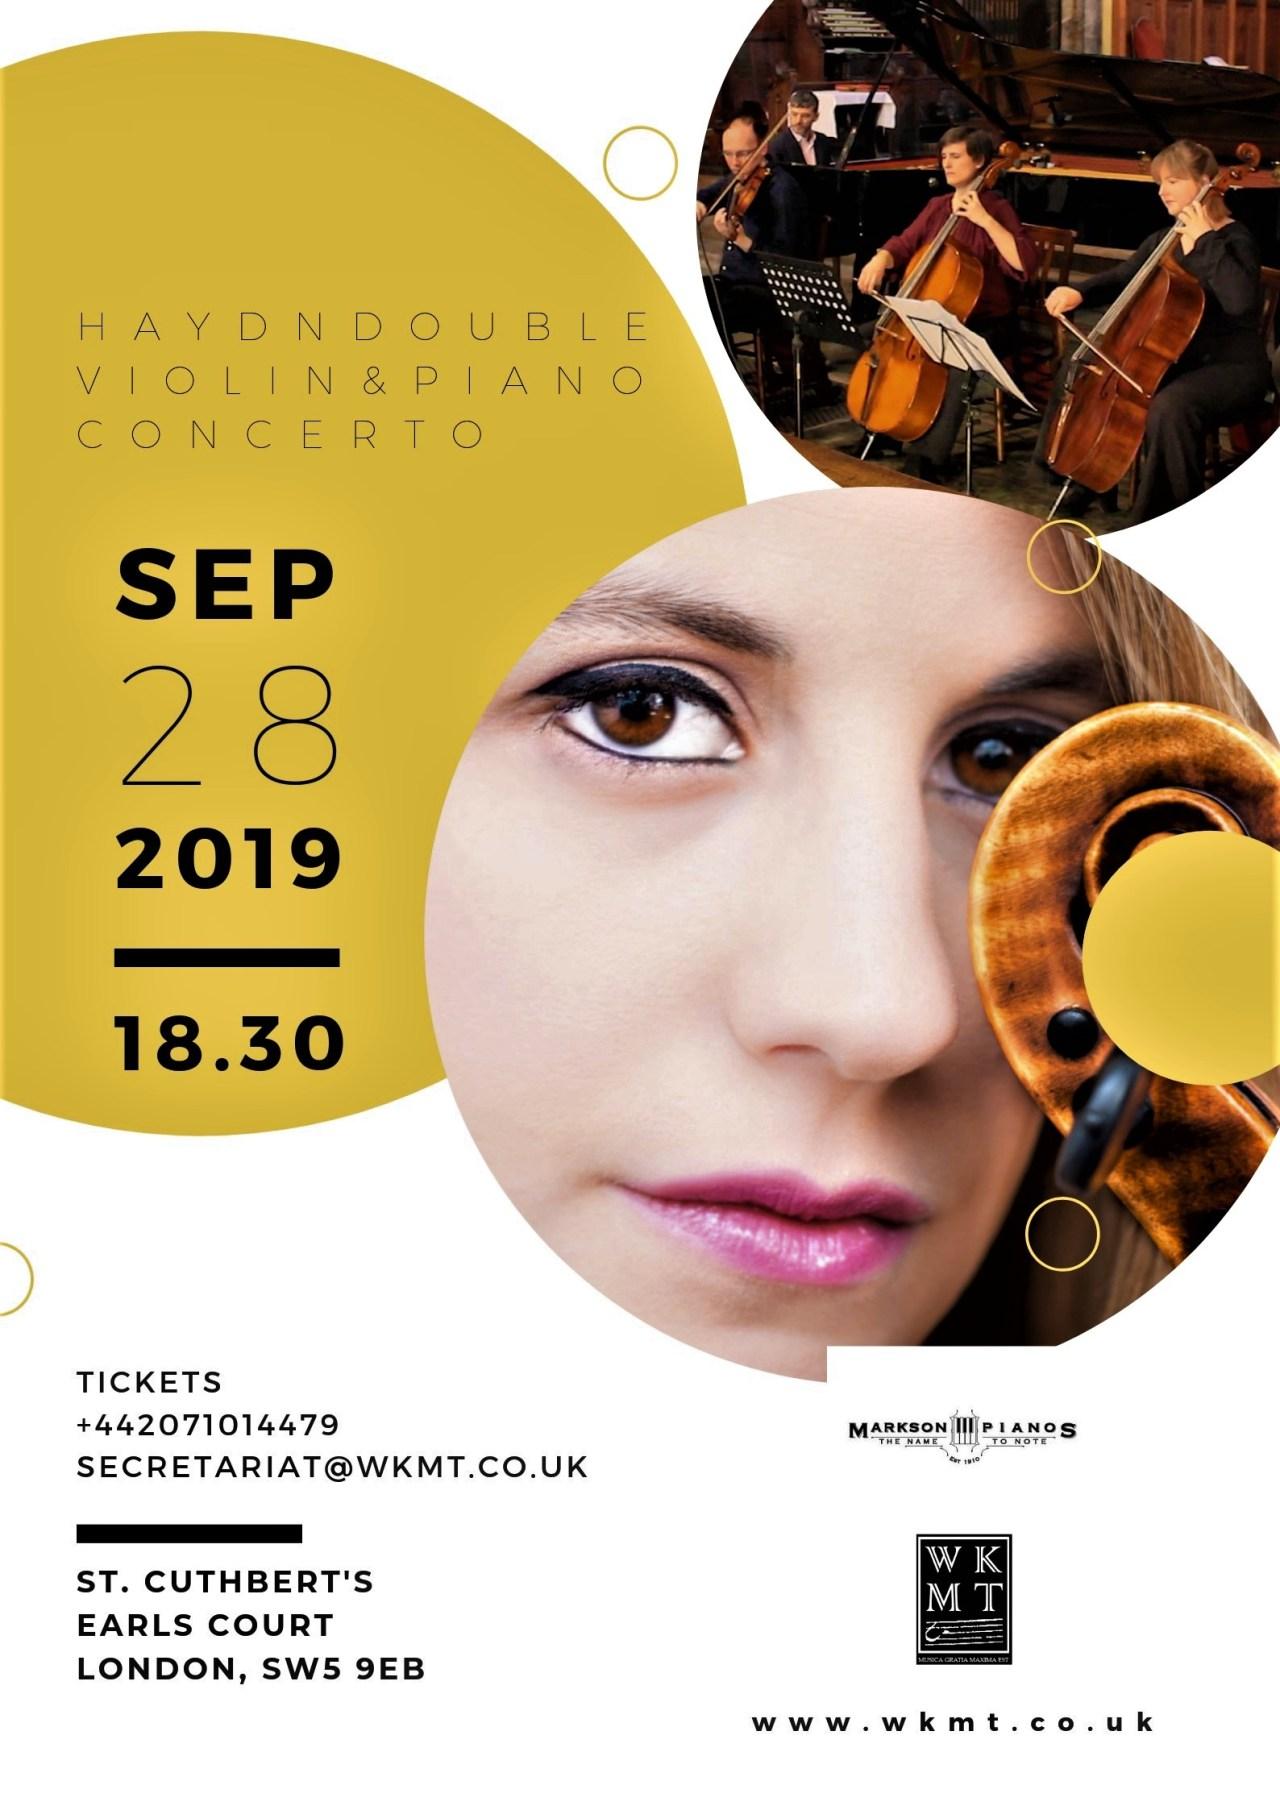 Juan Rezzuto plays Haydn piano concerto Hob XVIII:6 in London